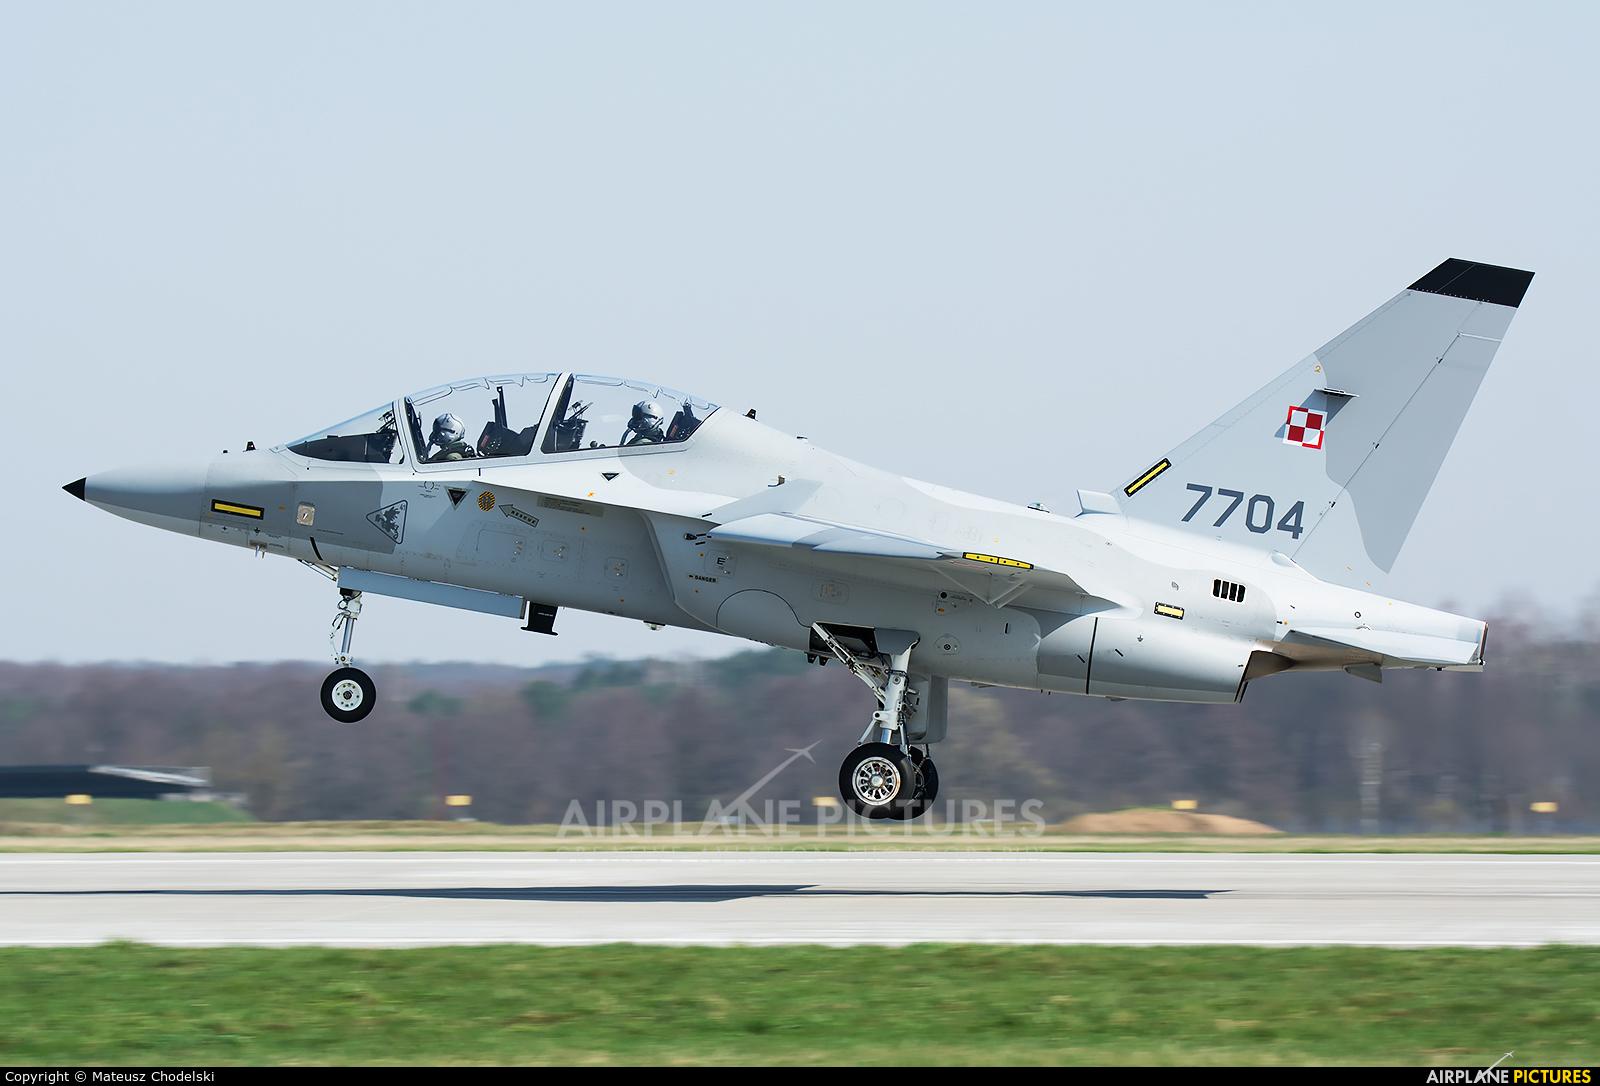 Poland - Air Force 7704 aircraft at Dęblin